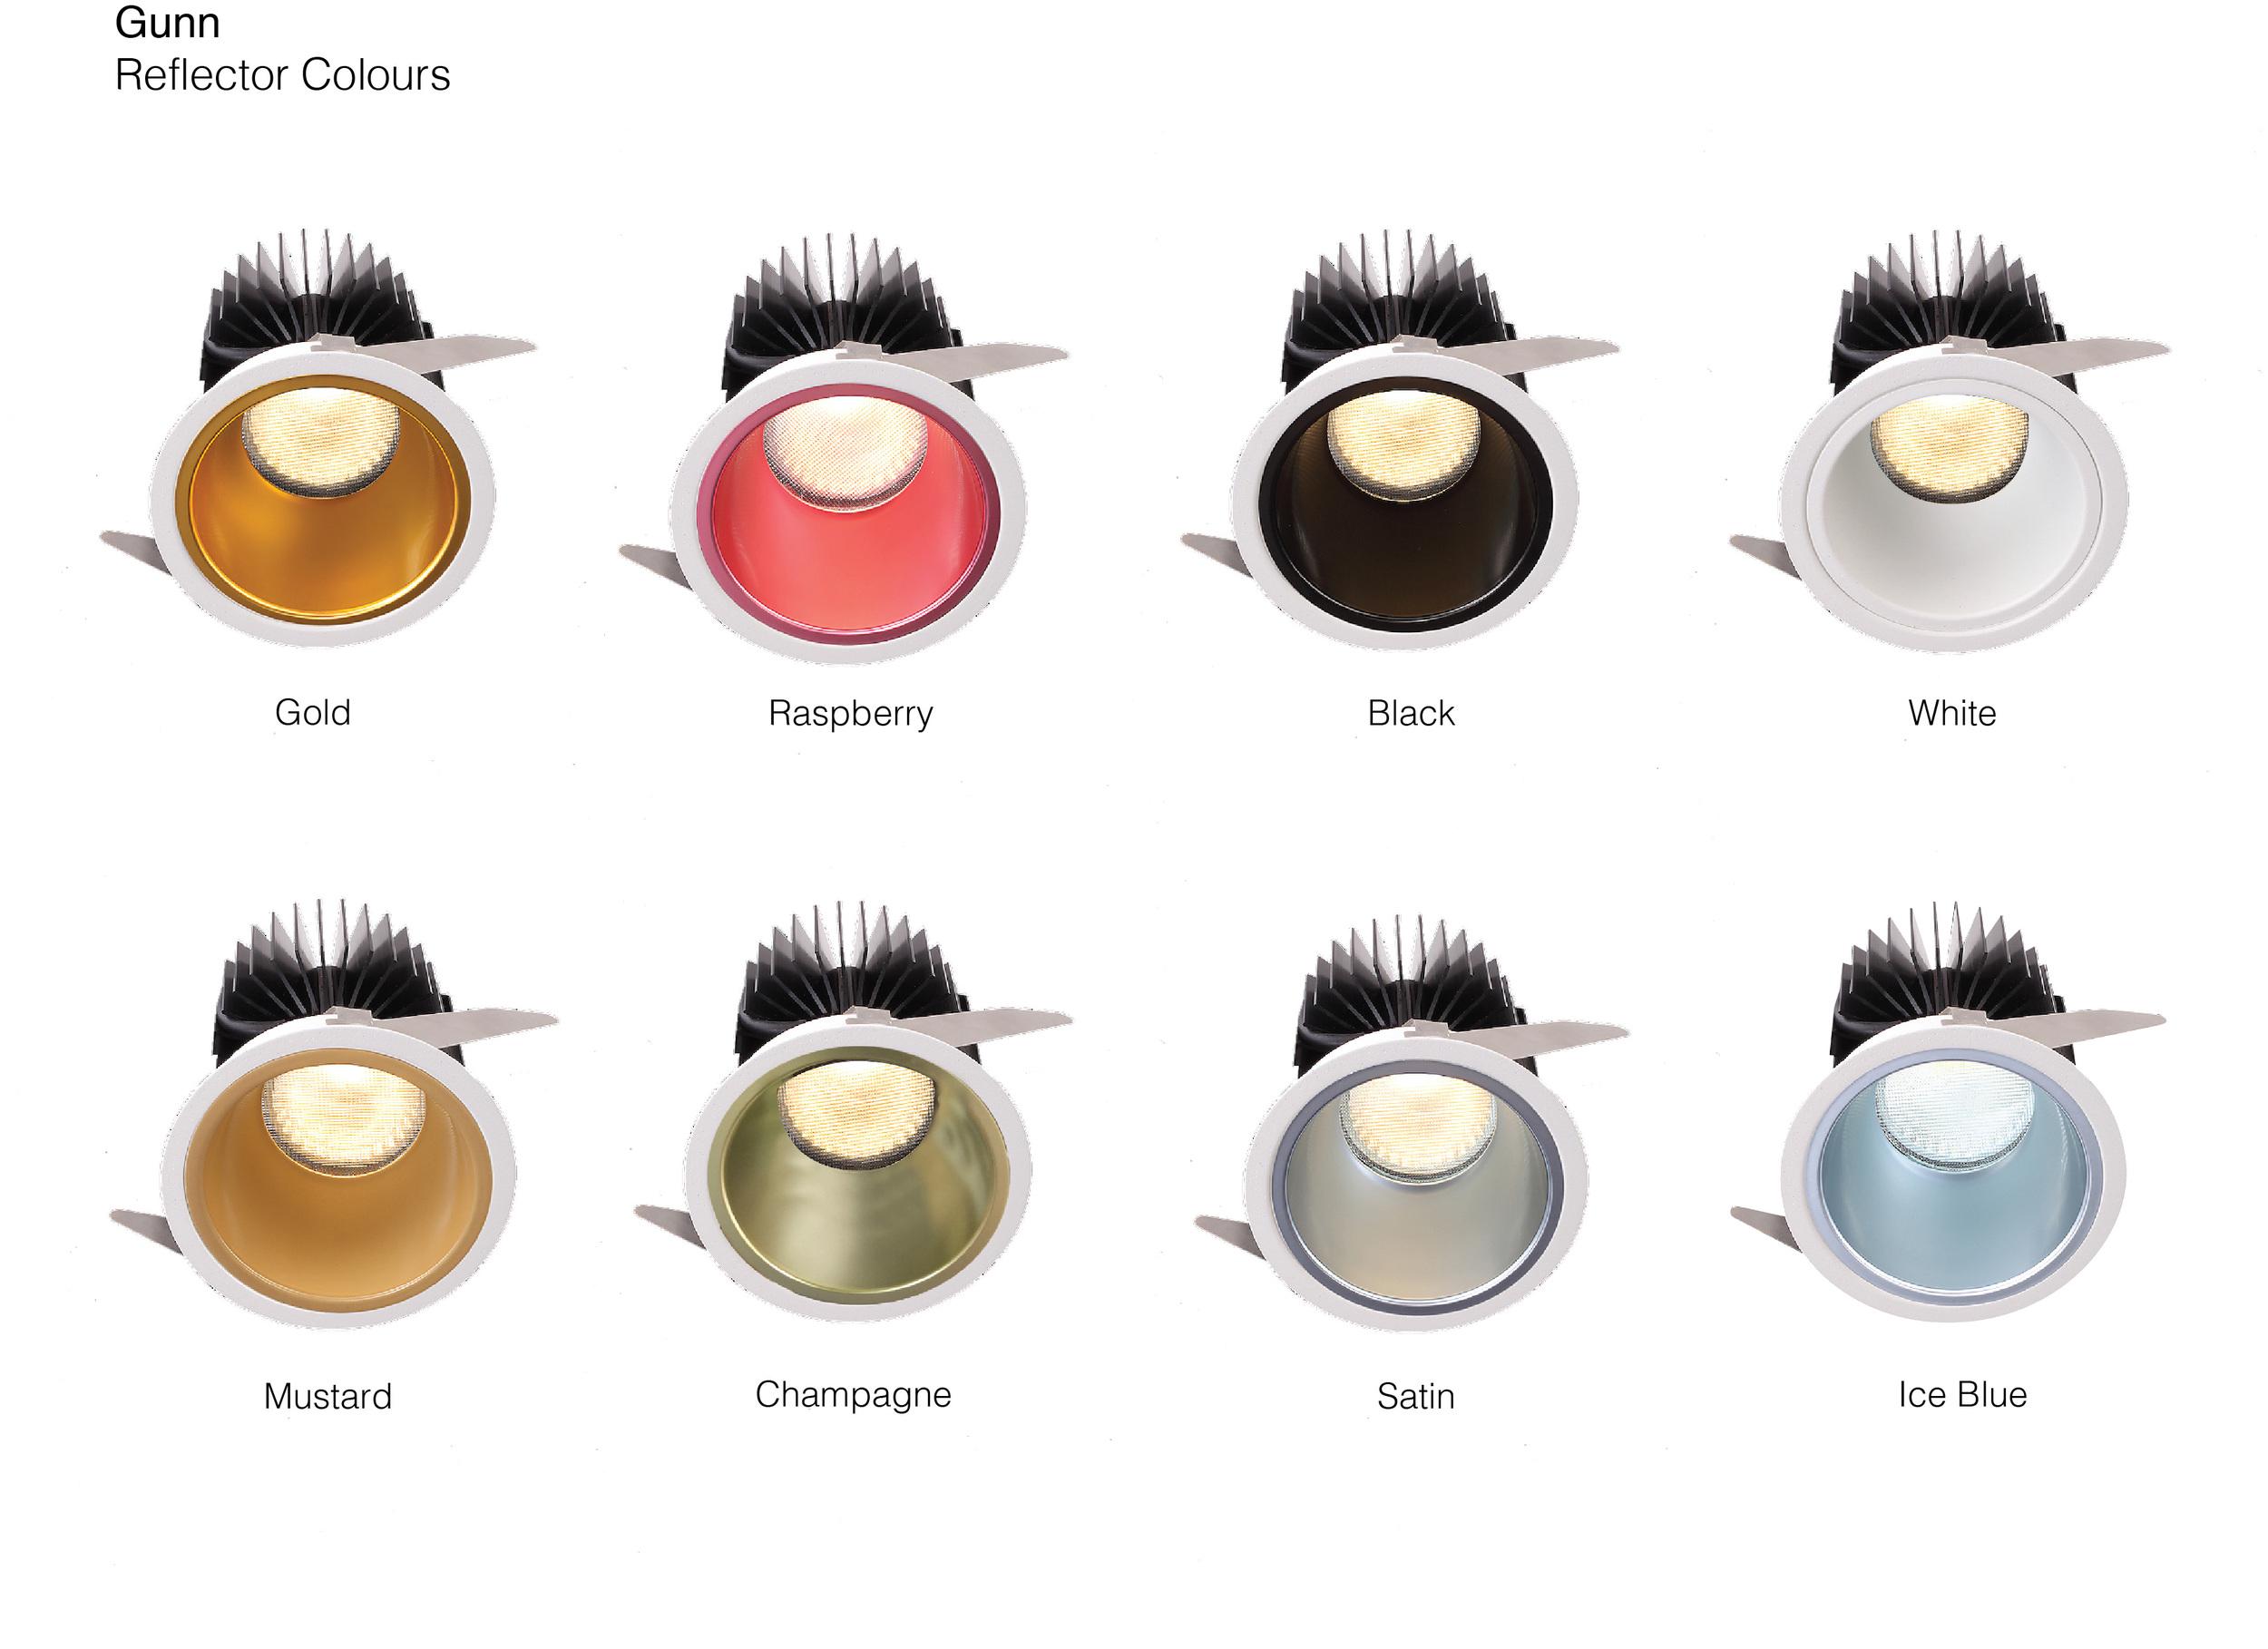 gunn_reflector_colours.jpg